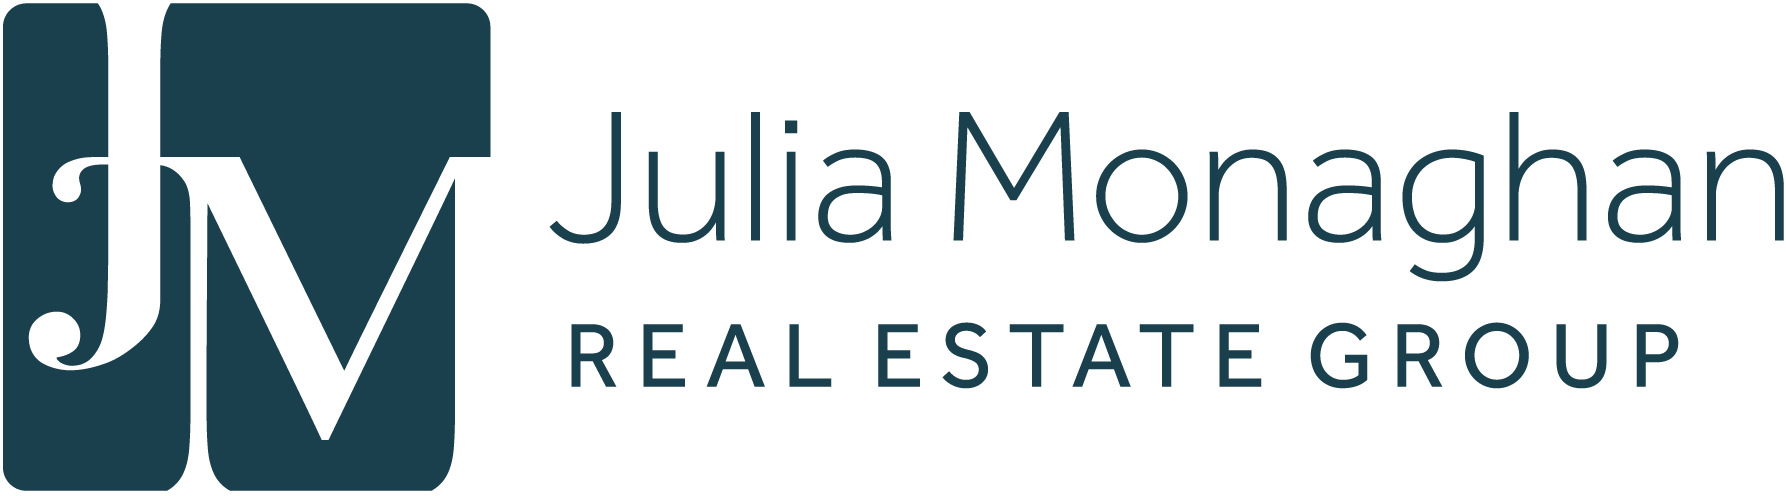 Portland Metro Real Estate Broker